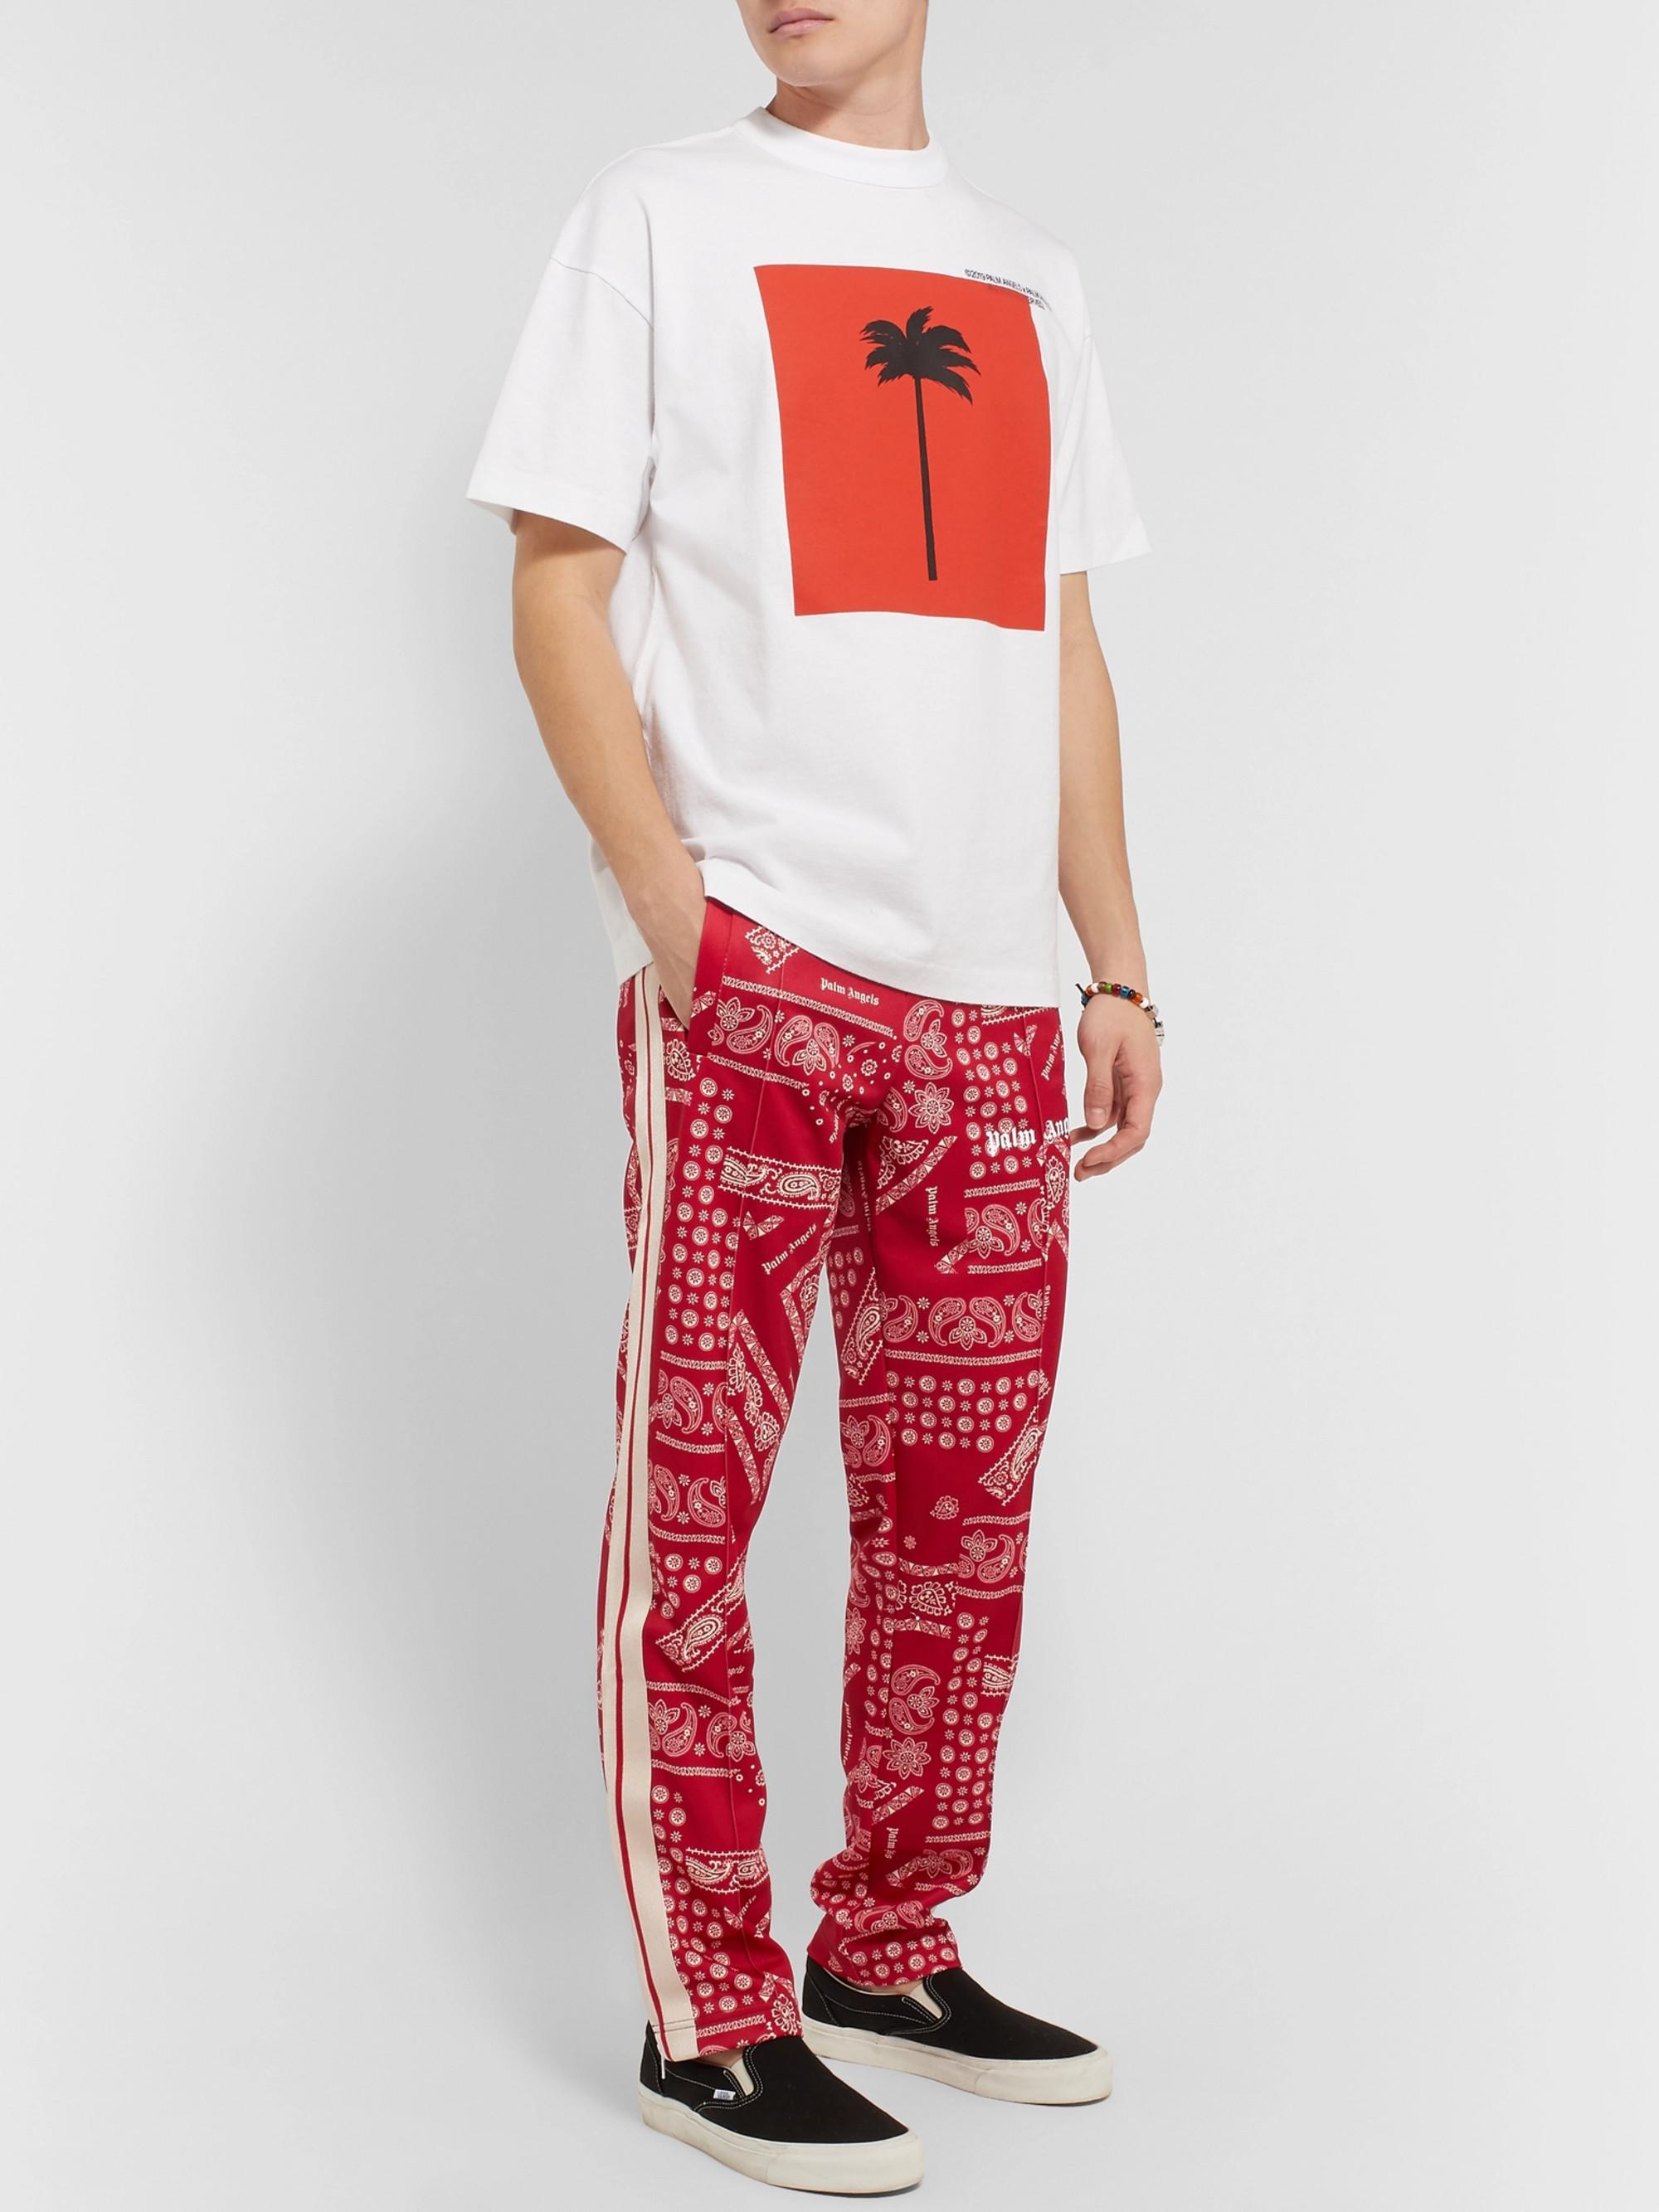 666d643c5b3e5c Palm Angels Webbing-Trimmed Printed Tech-Jersey Track Pants